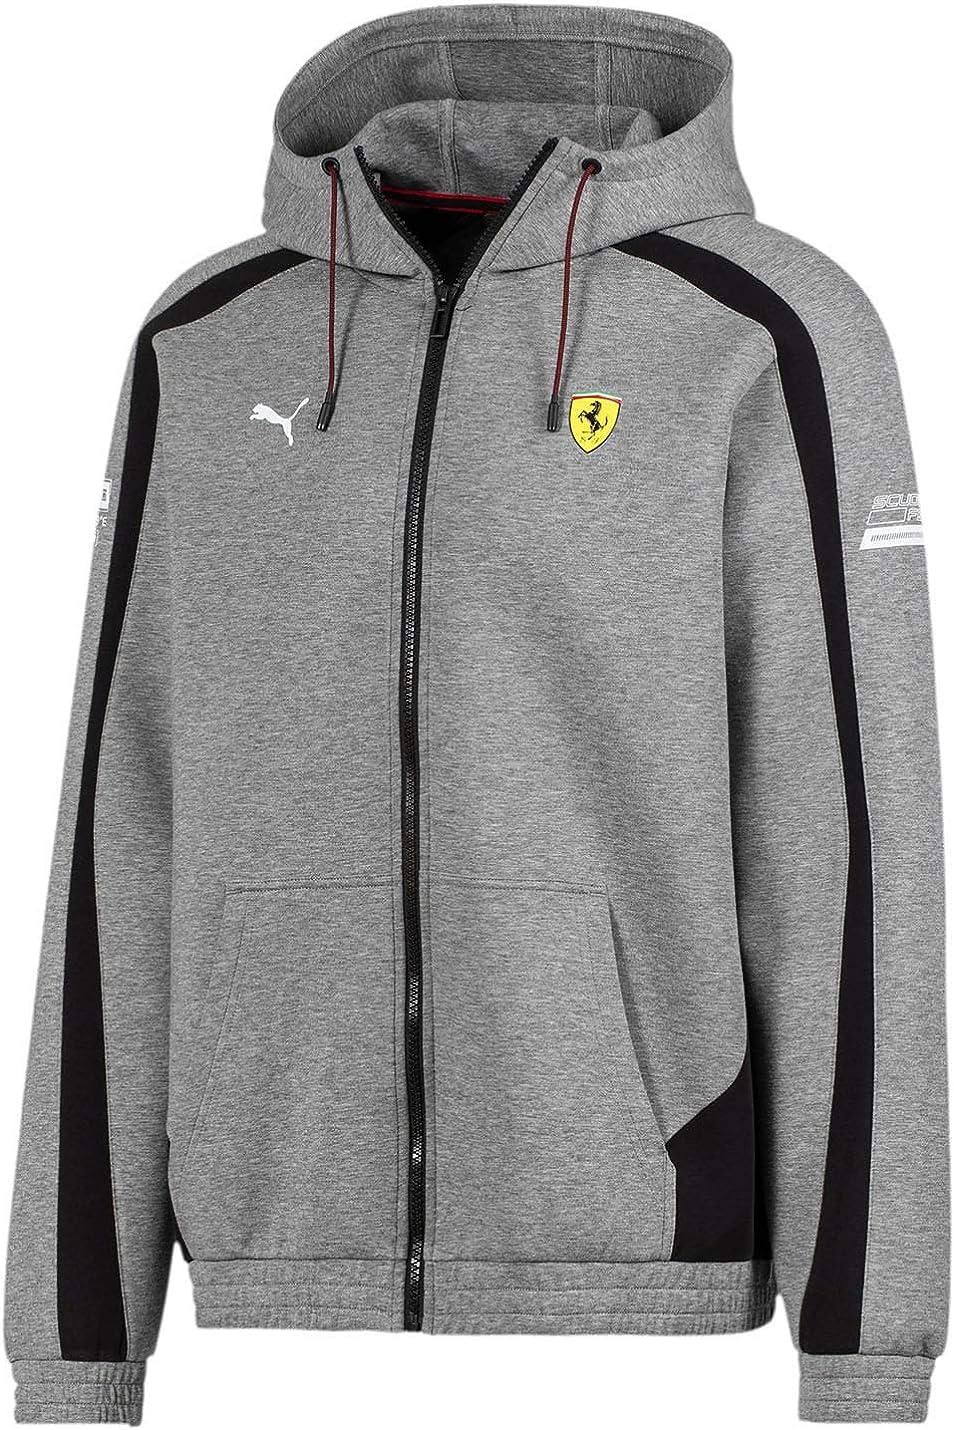 Amazon Com Puma Men S Scuderia Ferrari Hooded Jacket Clothing